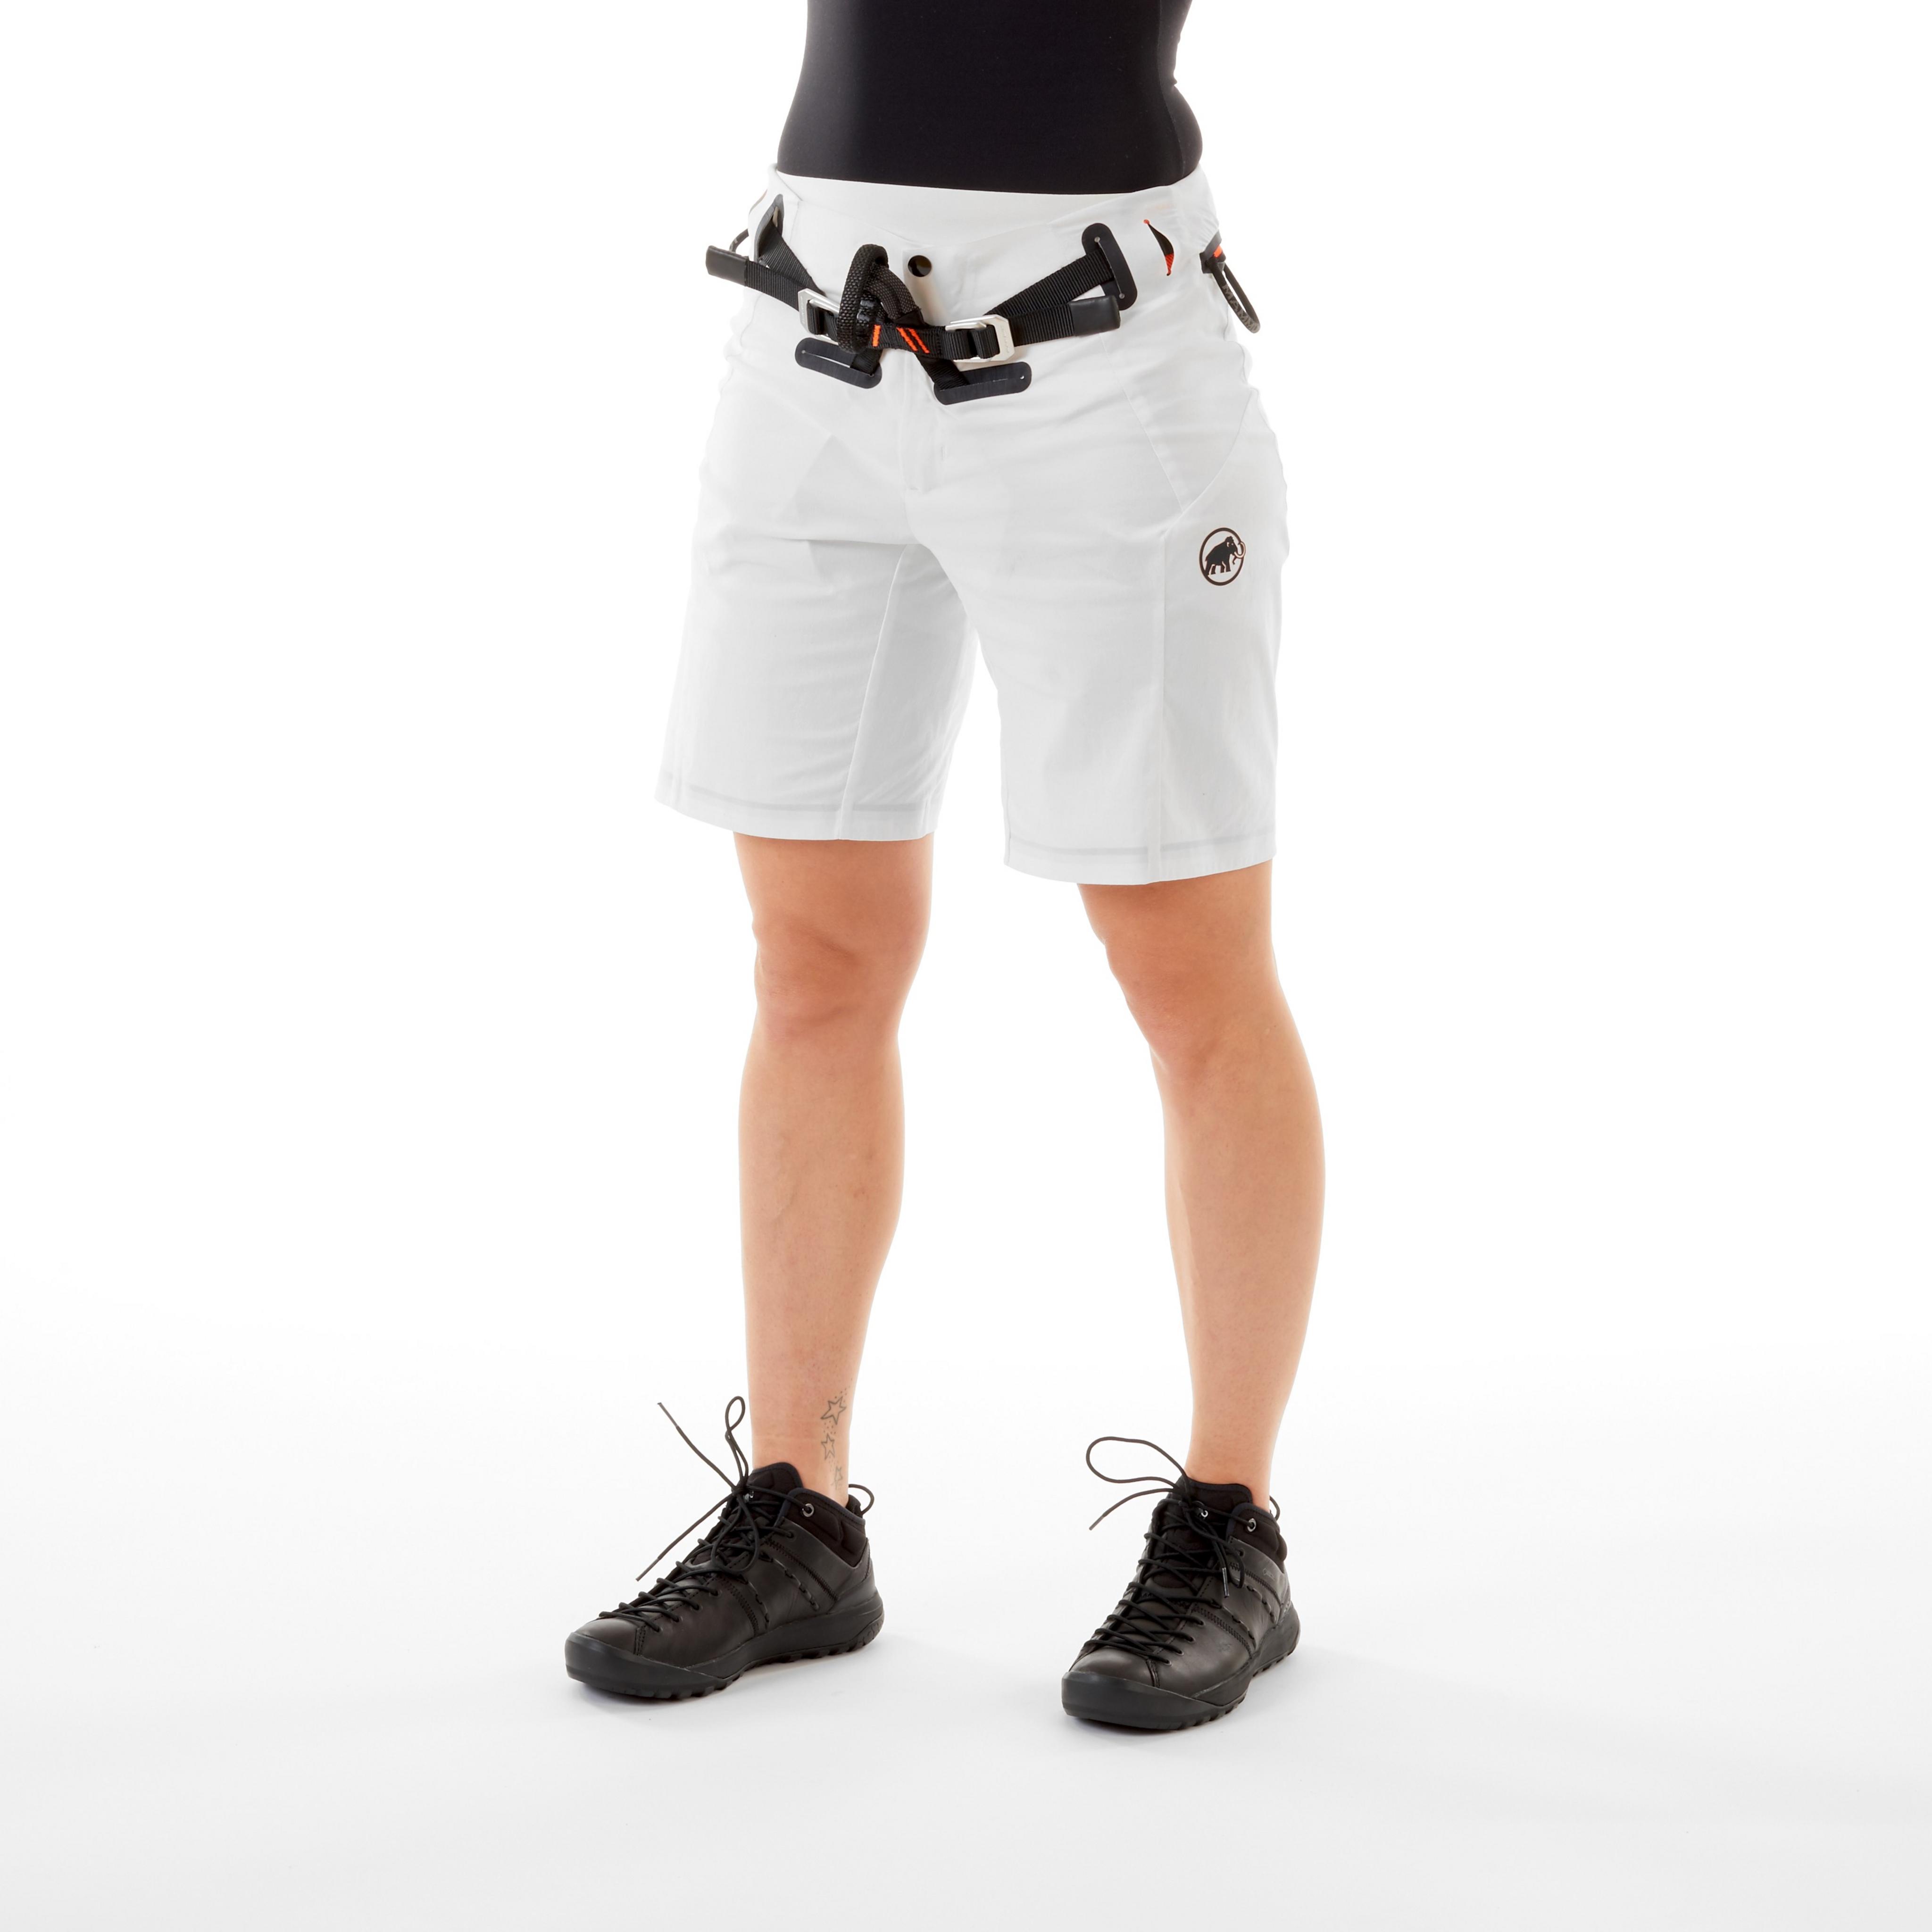 Realization Shorts 2.0 Women product image